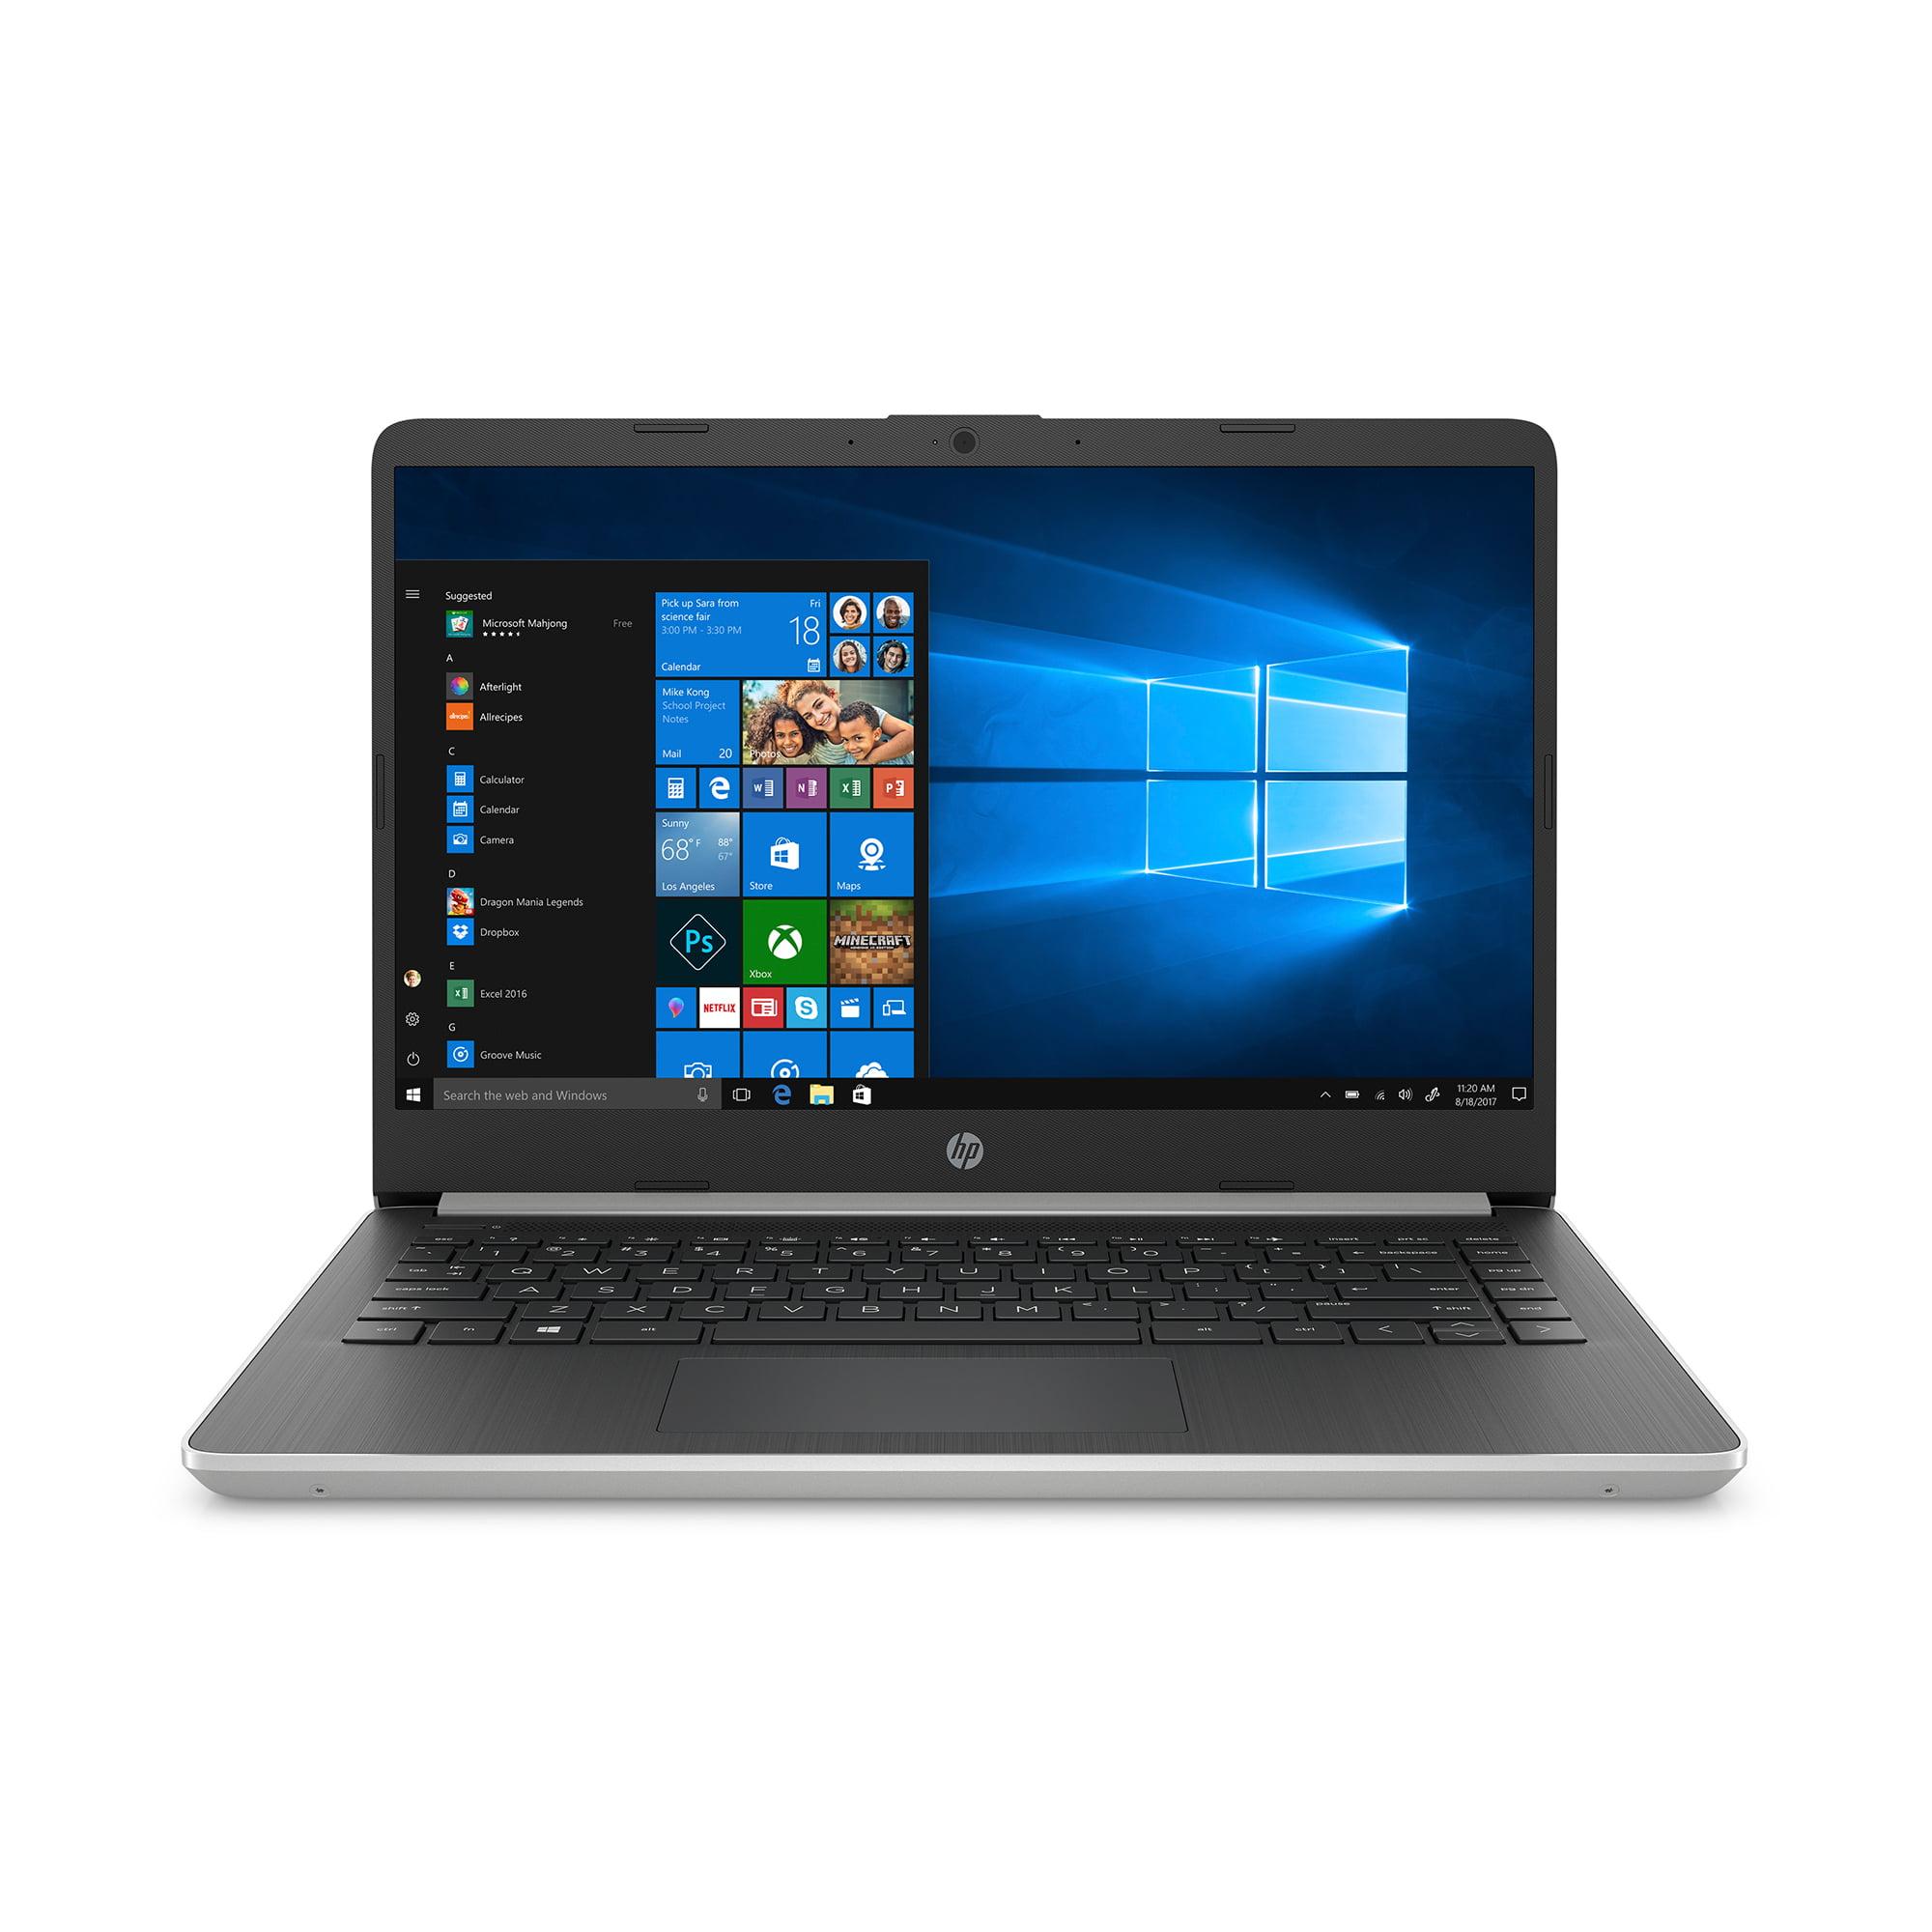 "HP 14"" Laptop, AMD Ryzen 3 3200U, 4GB SDRAM, 128GB SSD, Whisper Silver, 14-dk0028wm"